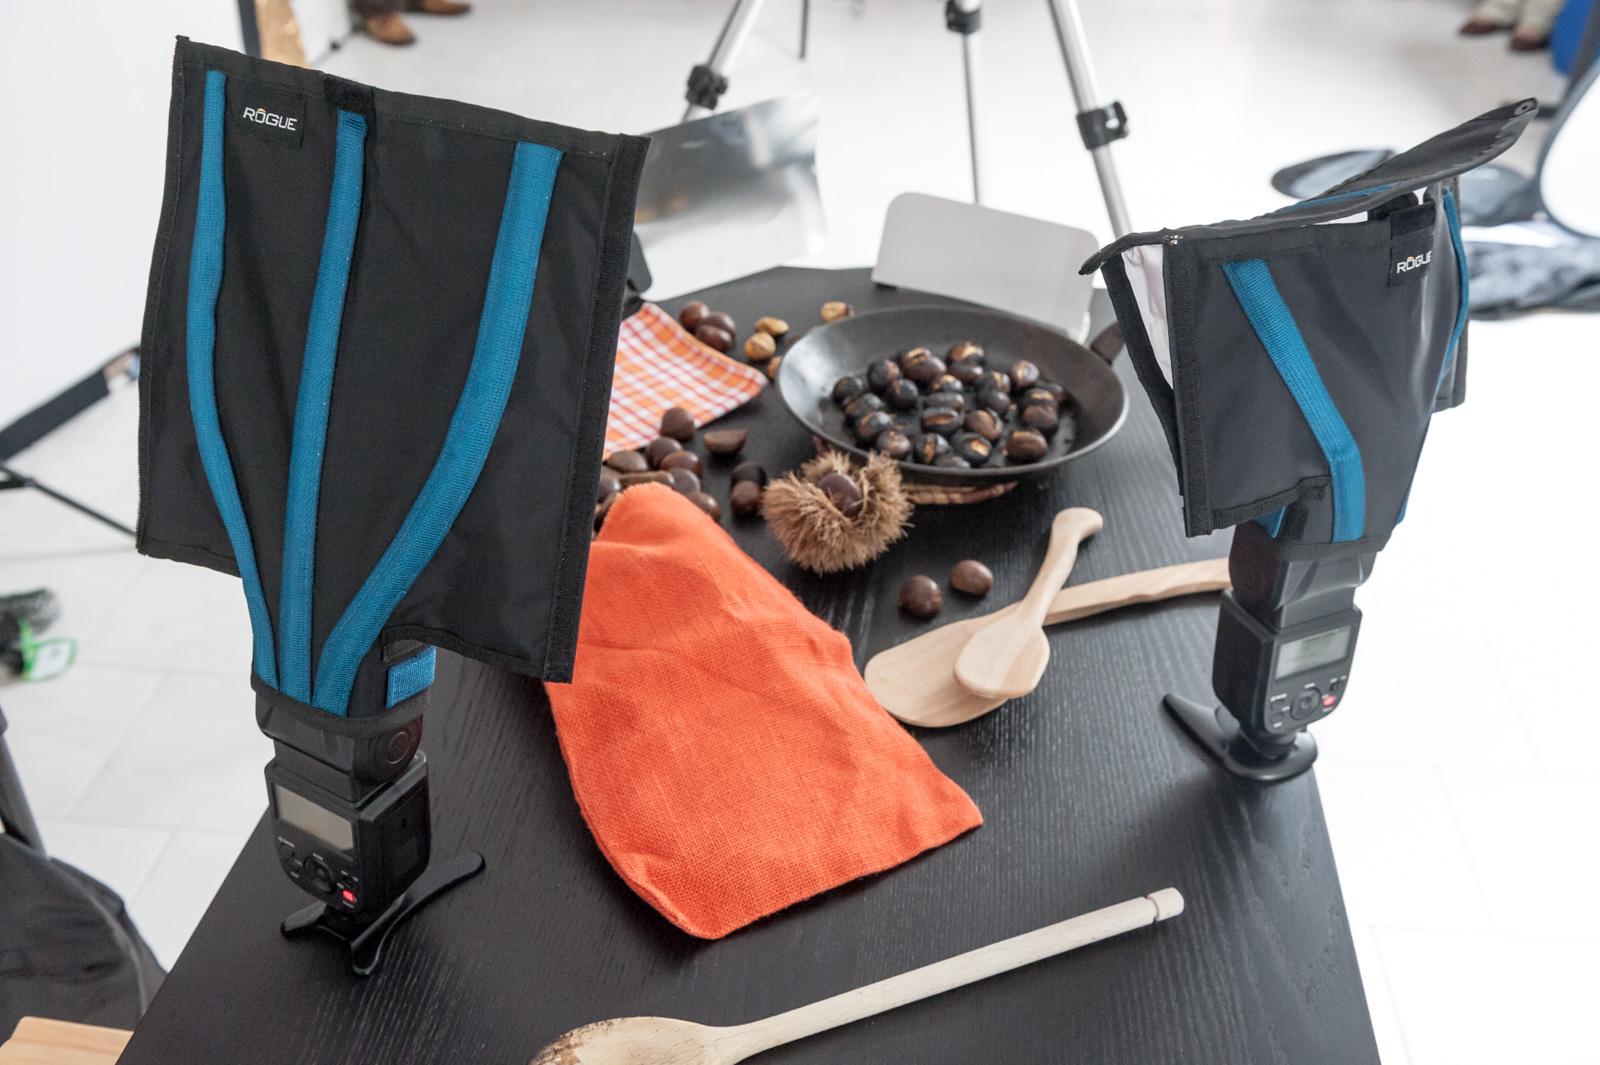 Le basi della food photography apromastore.eu